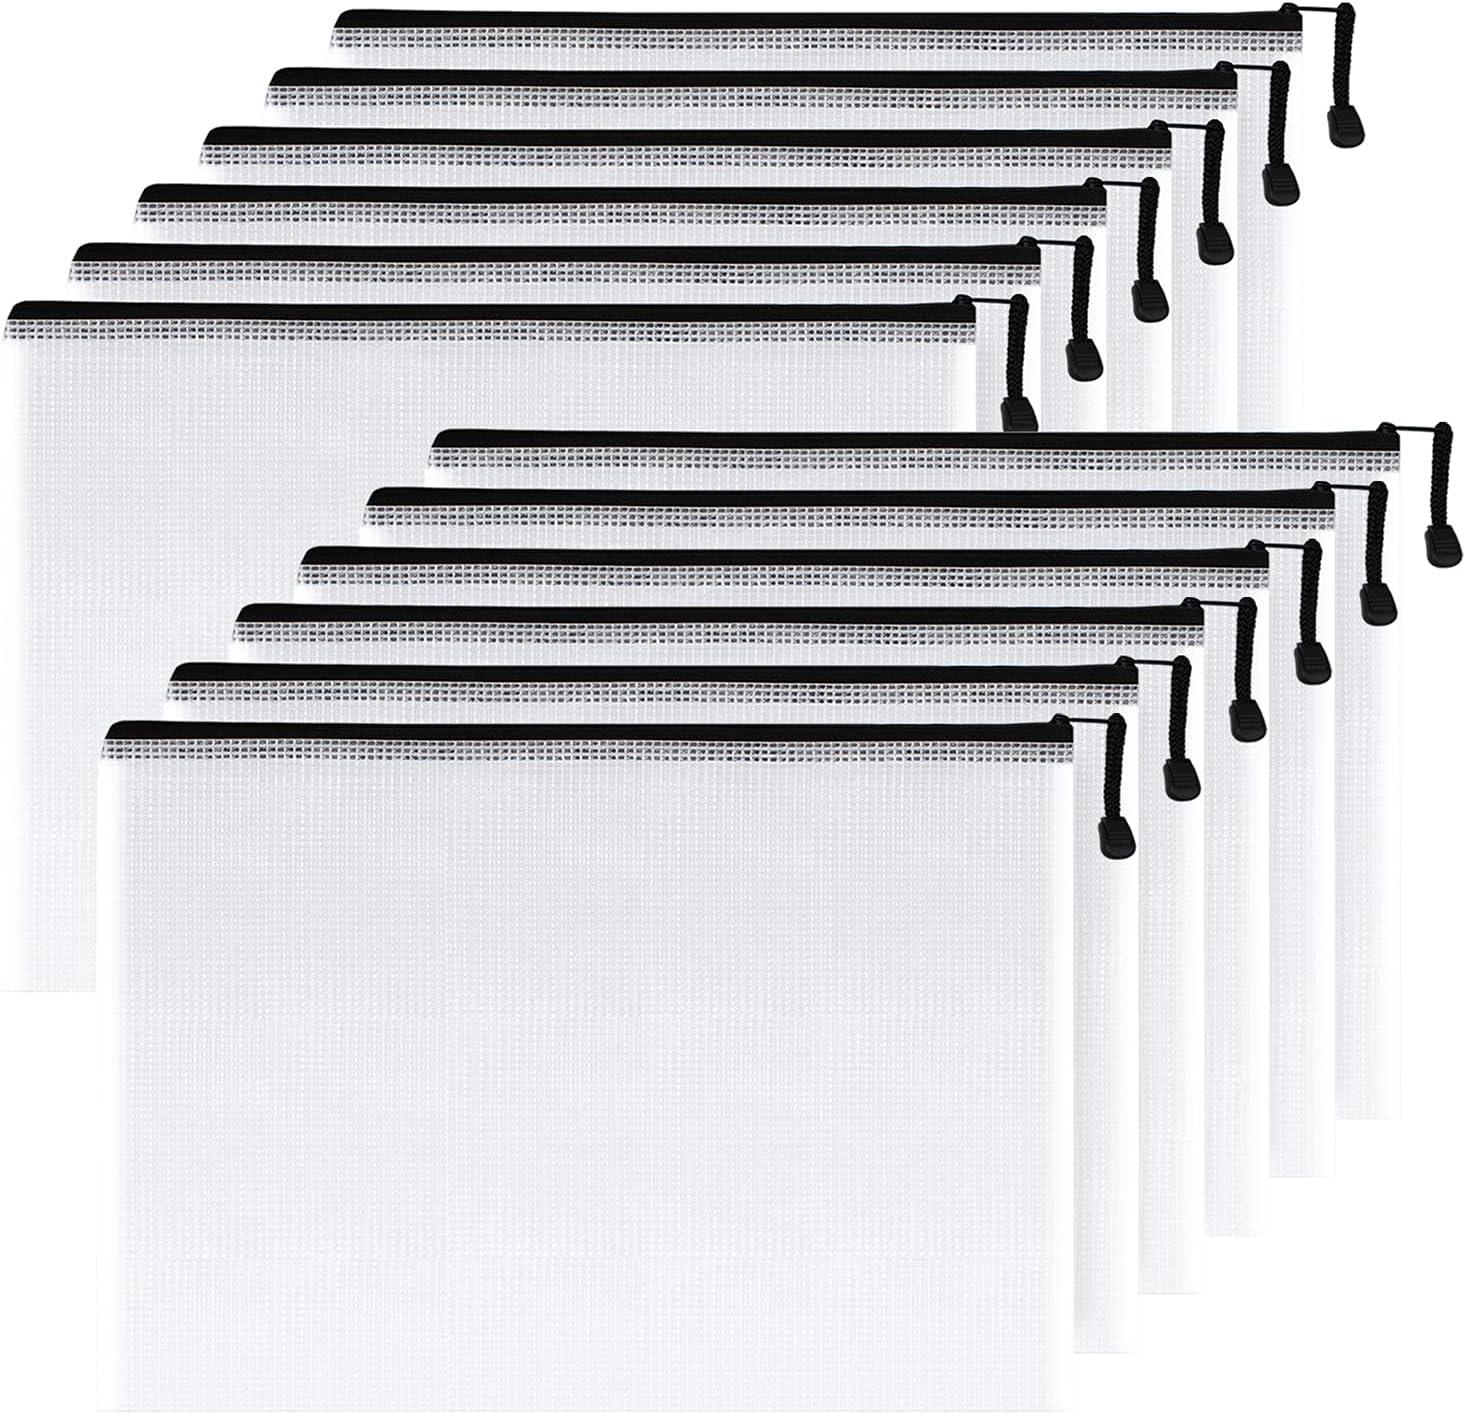 SUNEE Columbus Mall Plastic Mesh Zipper Pouch 11x16 Packs Cheap bargain Extra 12 in Black